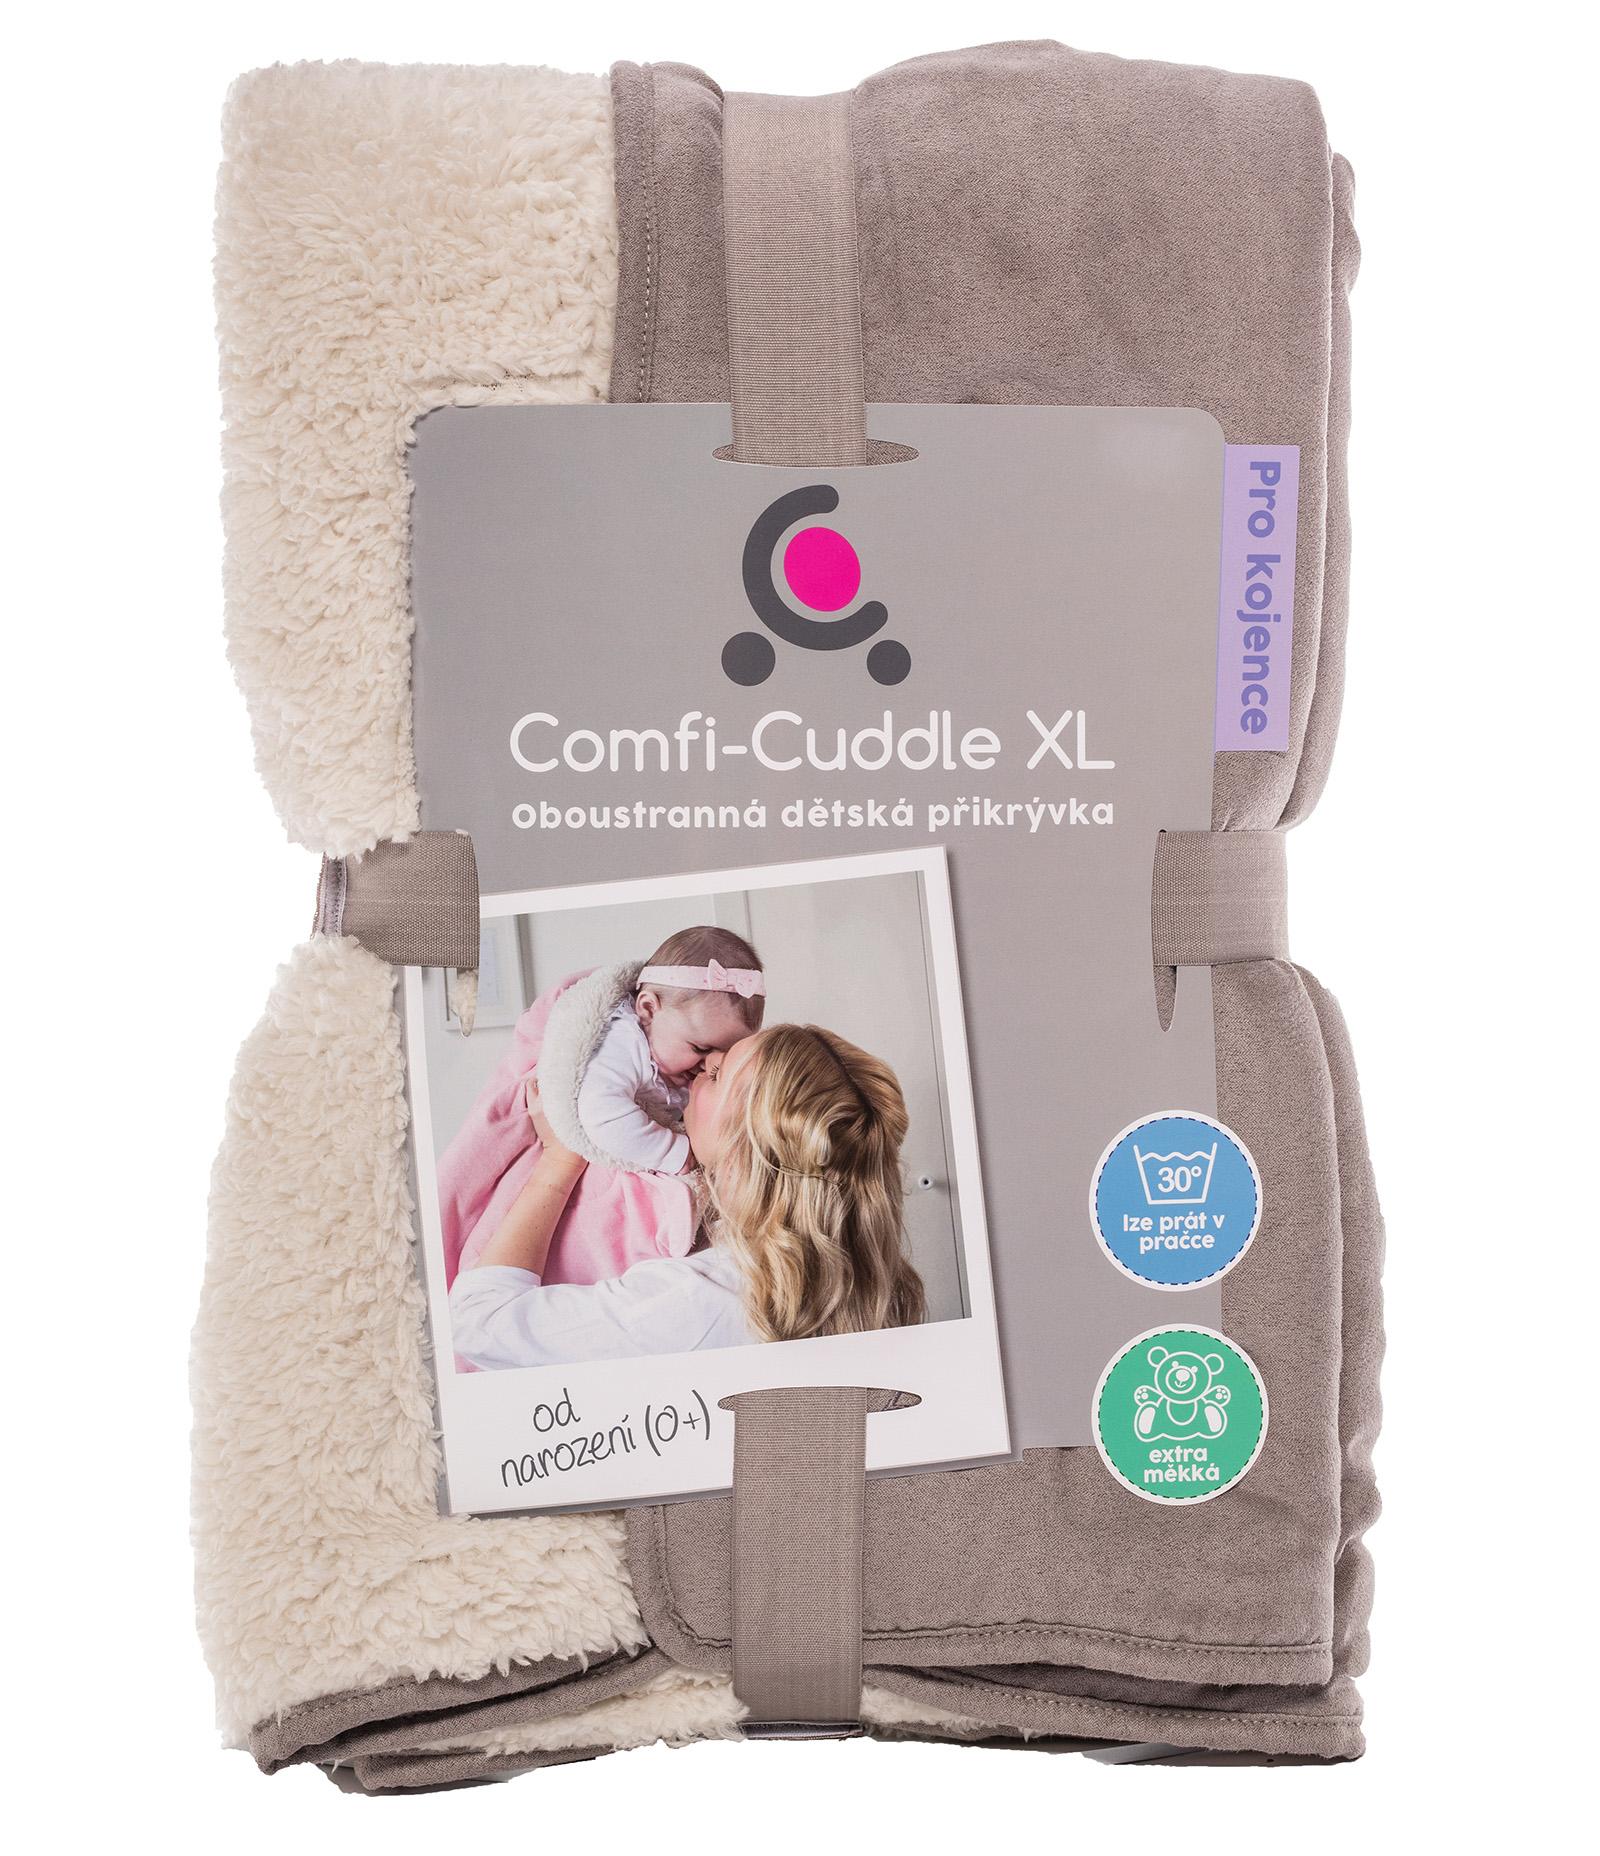 Cuddleco Dětská deka Comfi-Cuddle 140x100cm - Pebble